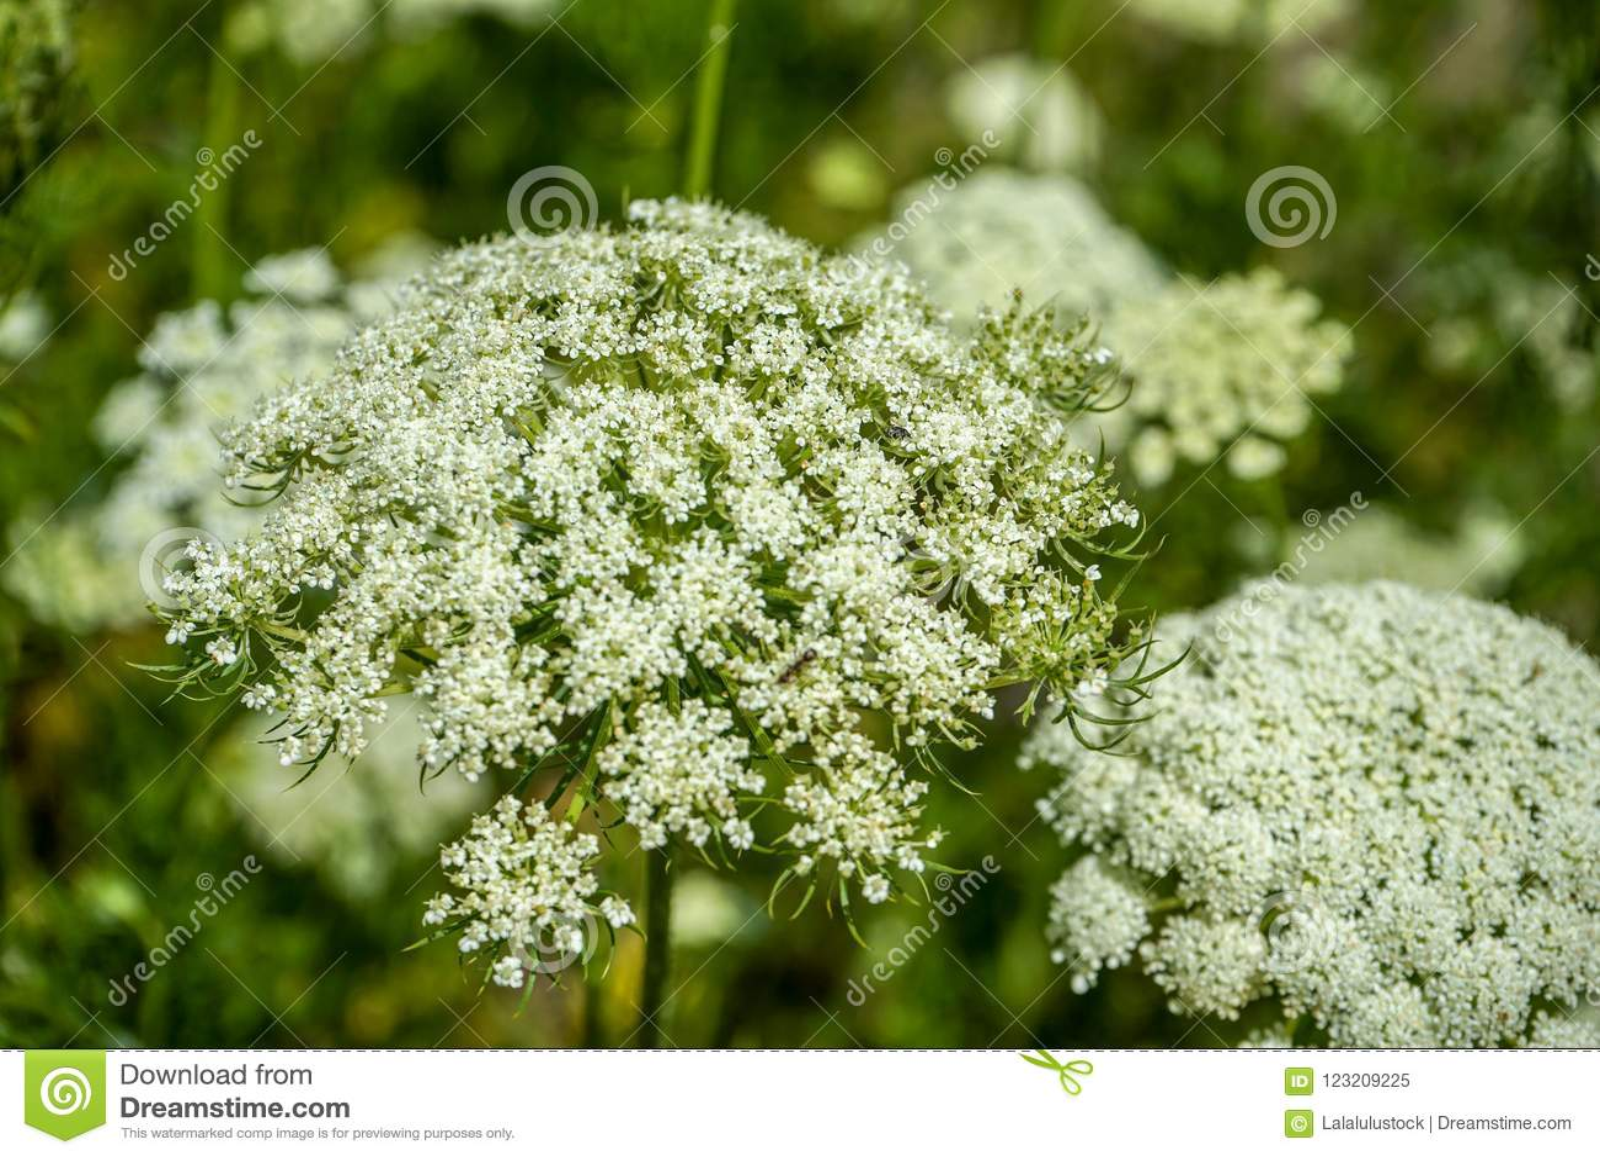 Fiori Selvatici Bianchi.Blooming White Flowers Of Wild Carrot Daucus Carota Stock Image